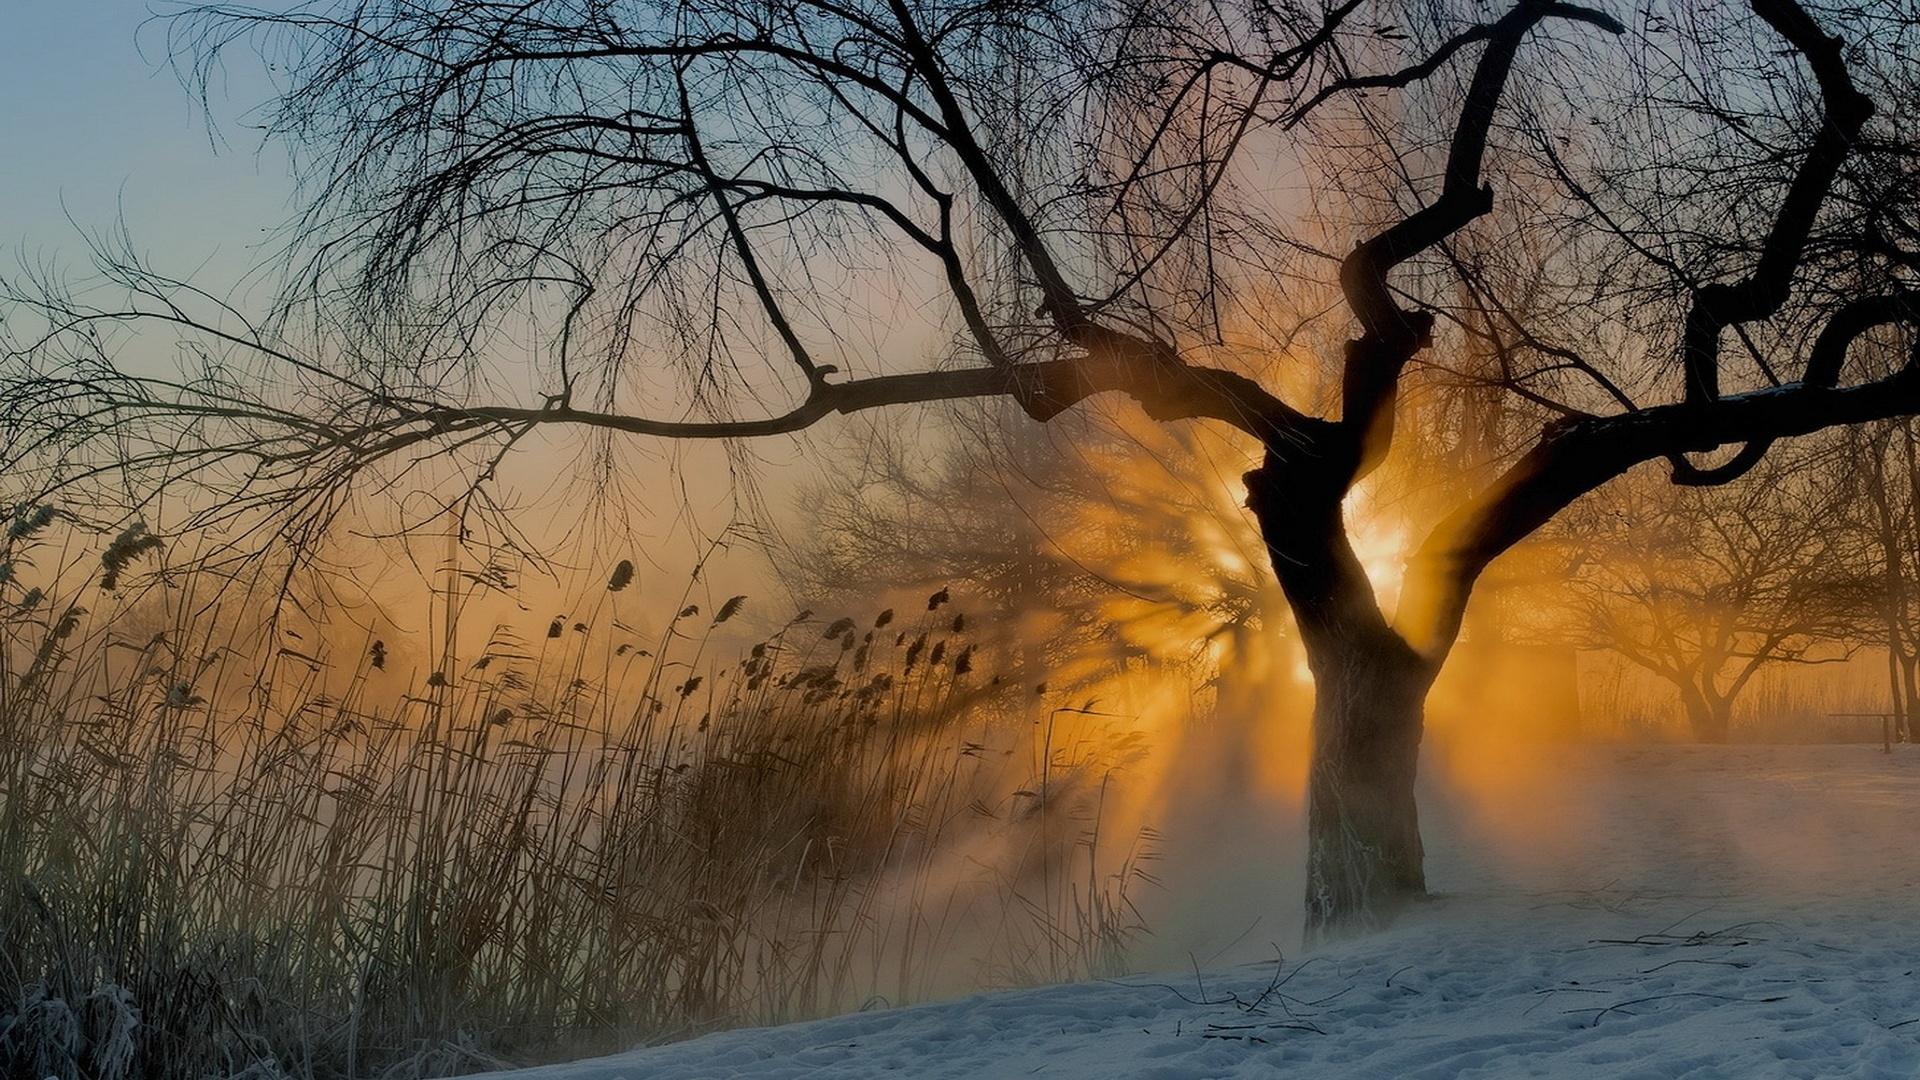 sun fog sunrise trees - photo #24